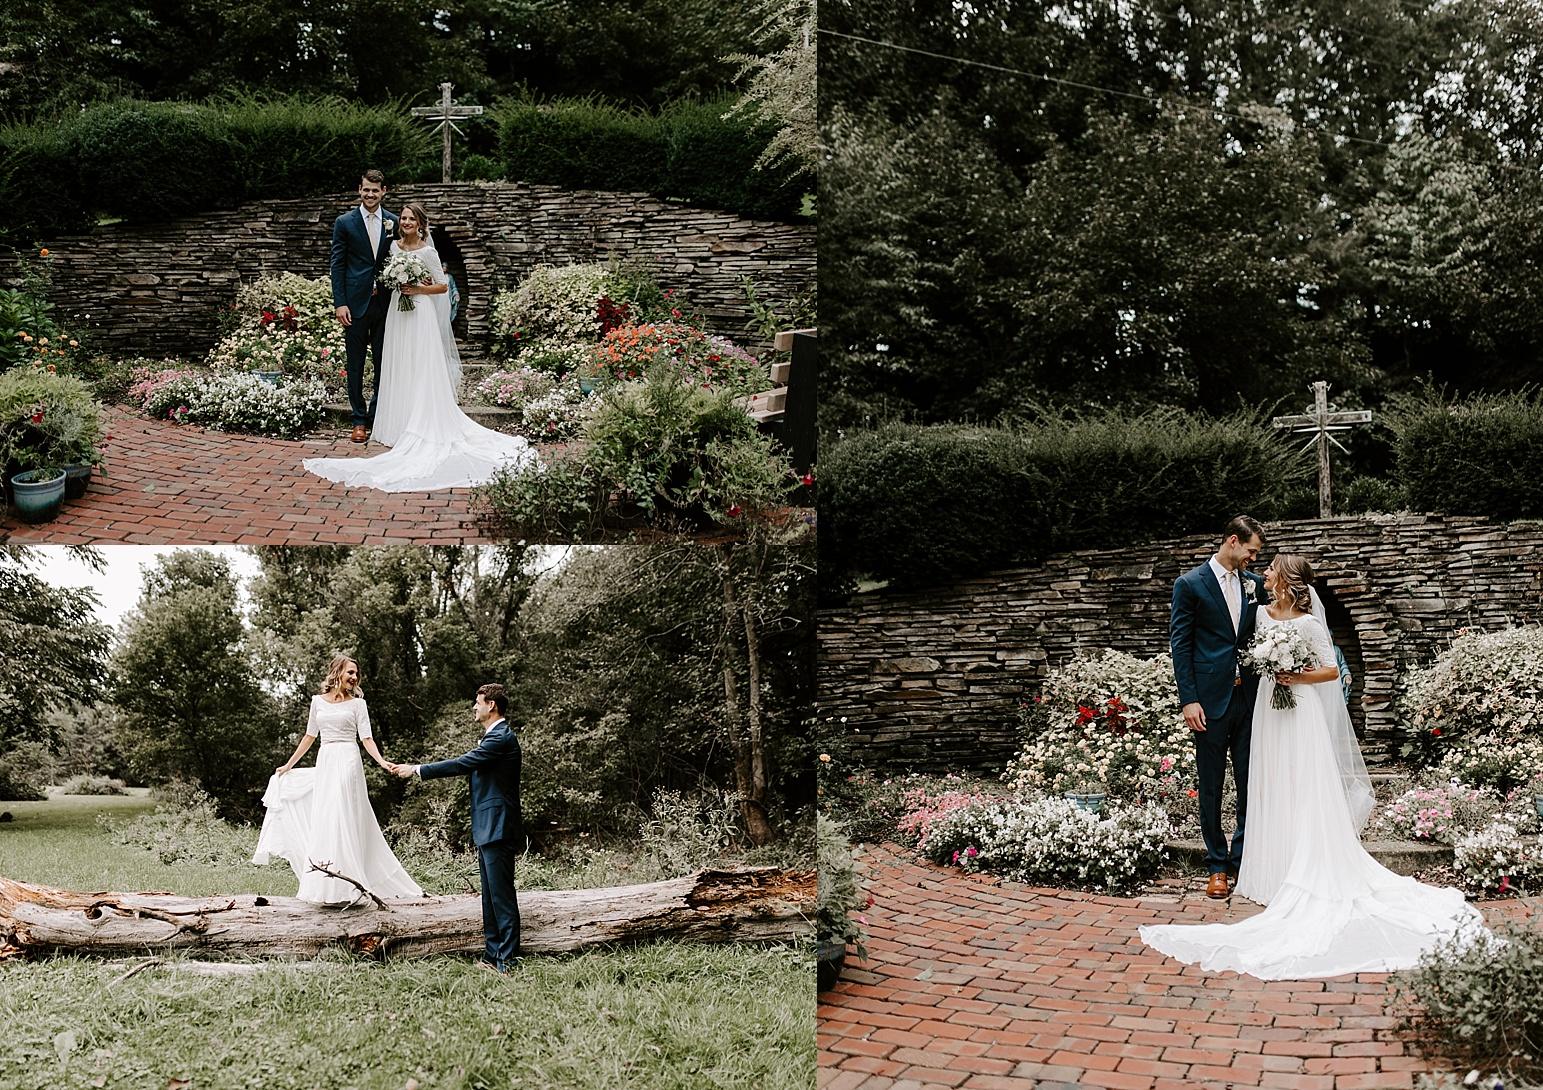 ashley-sara-photography-pittsburgh-photographer-wedding-photographer-brookside-farm-wedding-louisville-ohio.jpg6.jpg